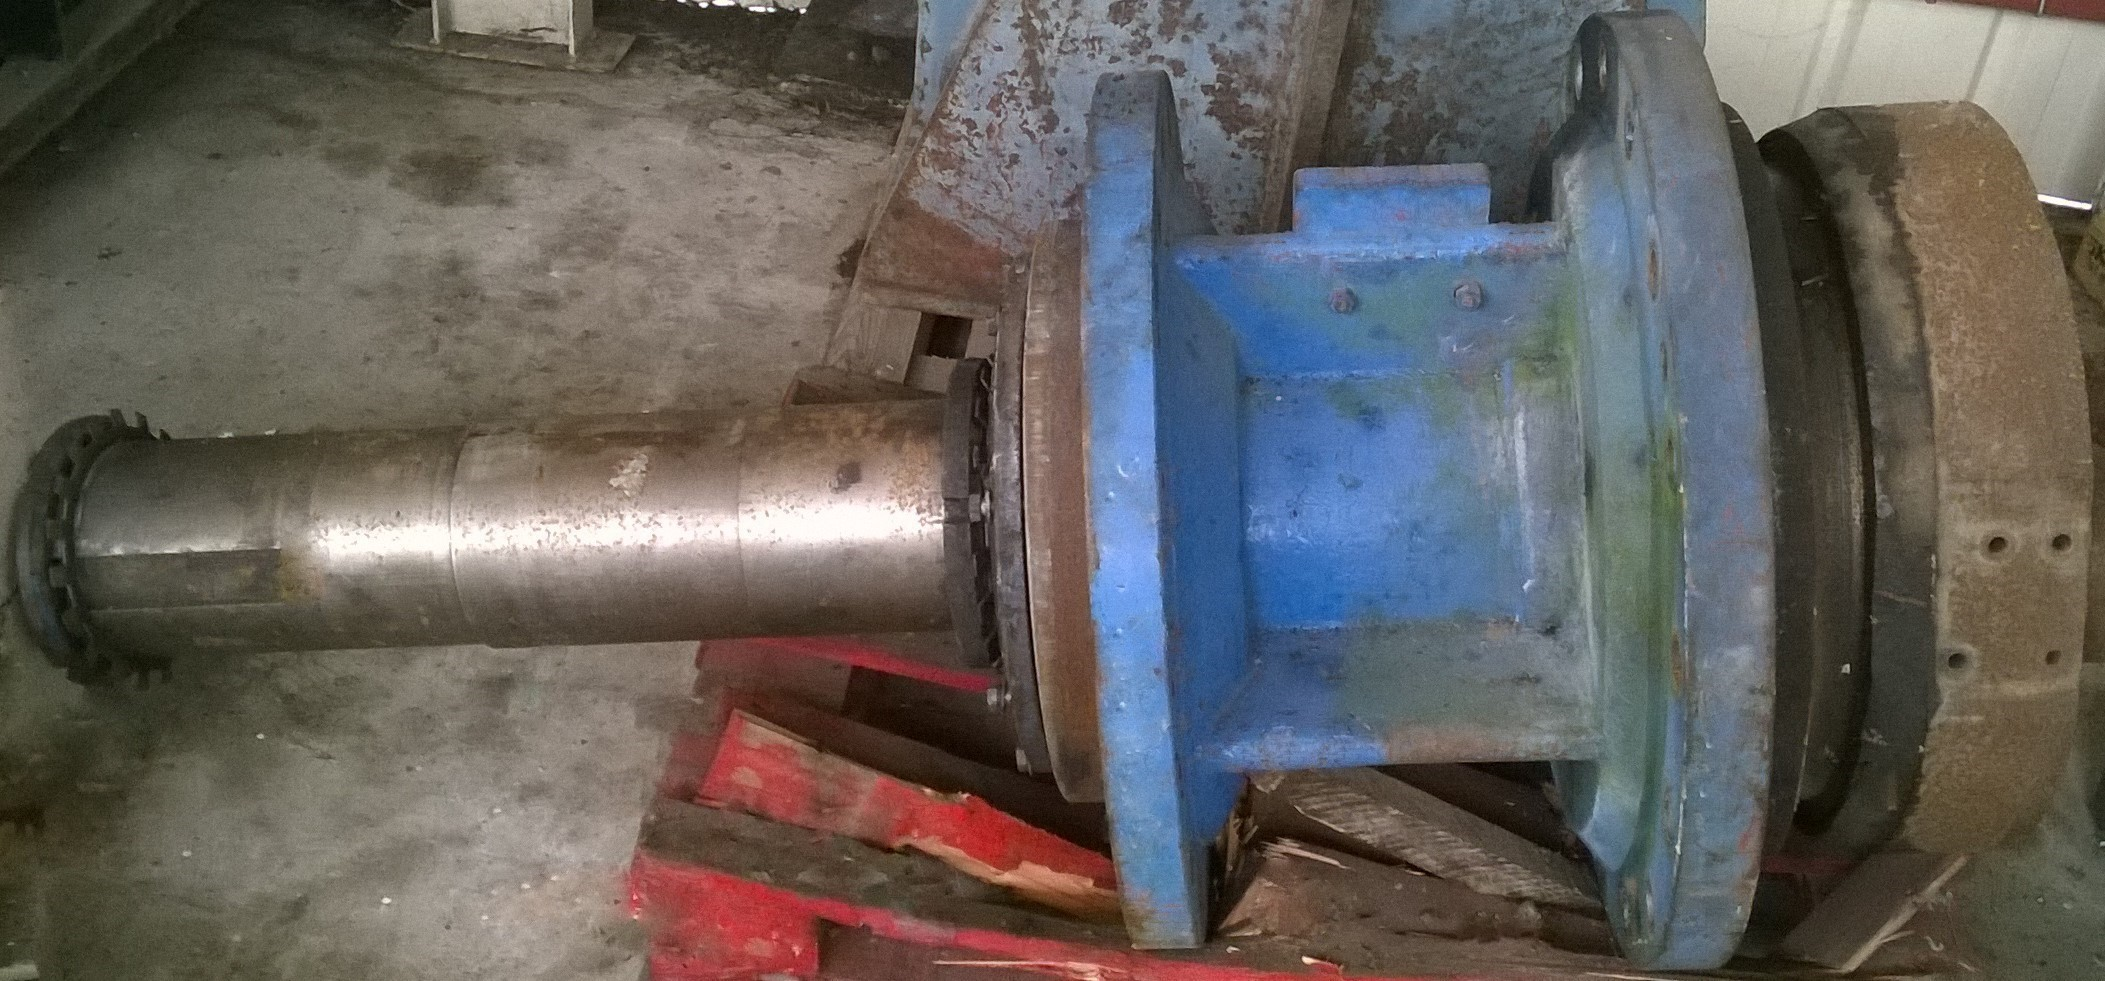 Rotor Promill 1800 BT 205